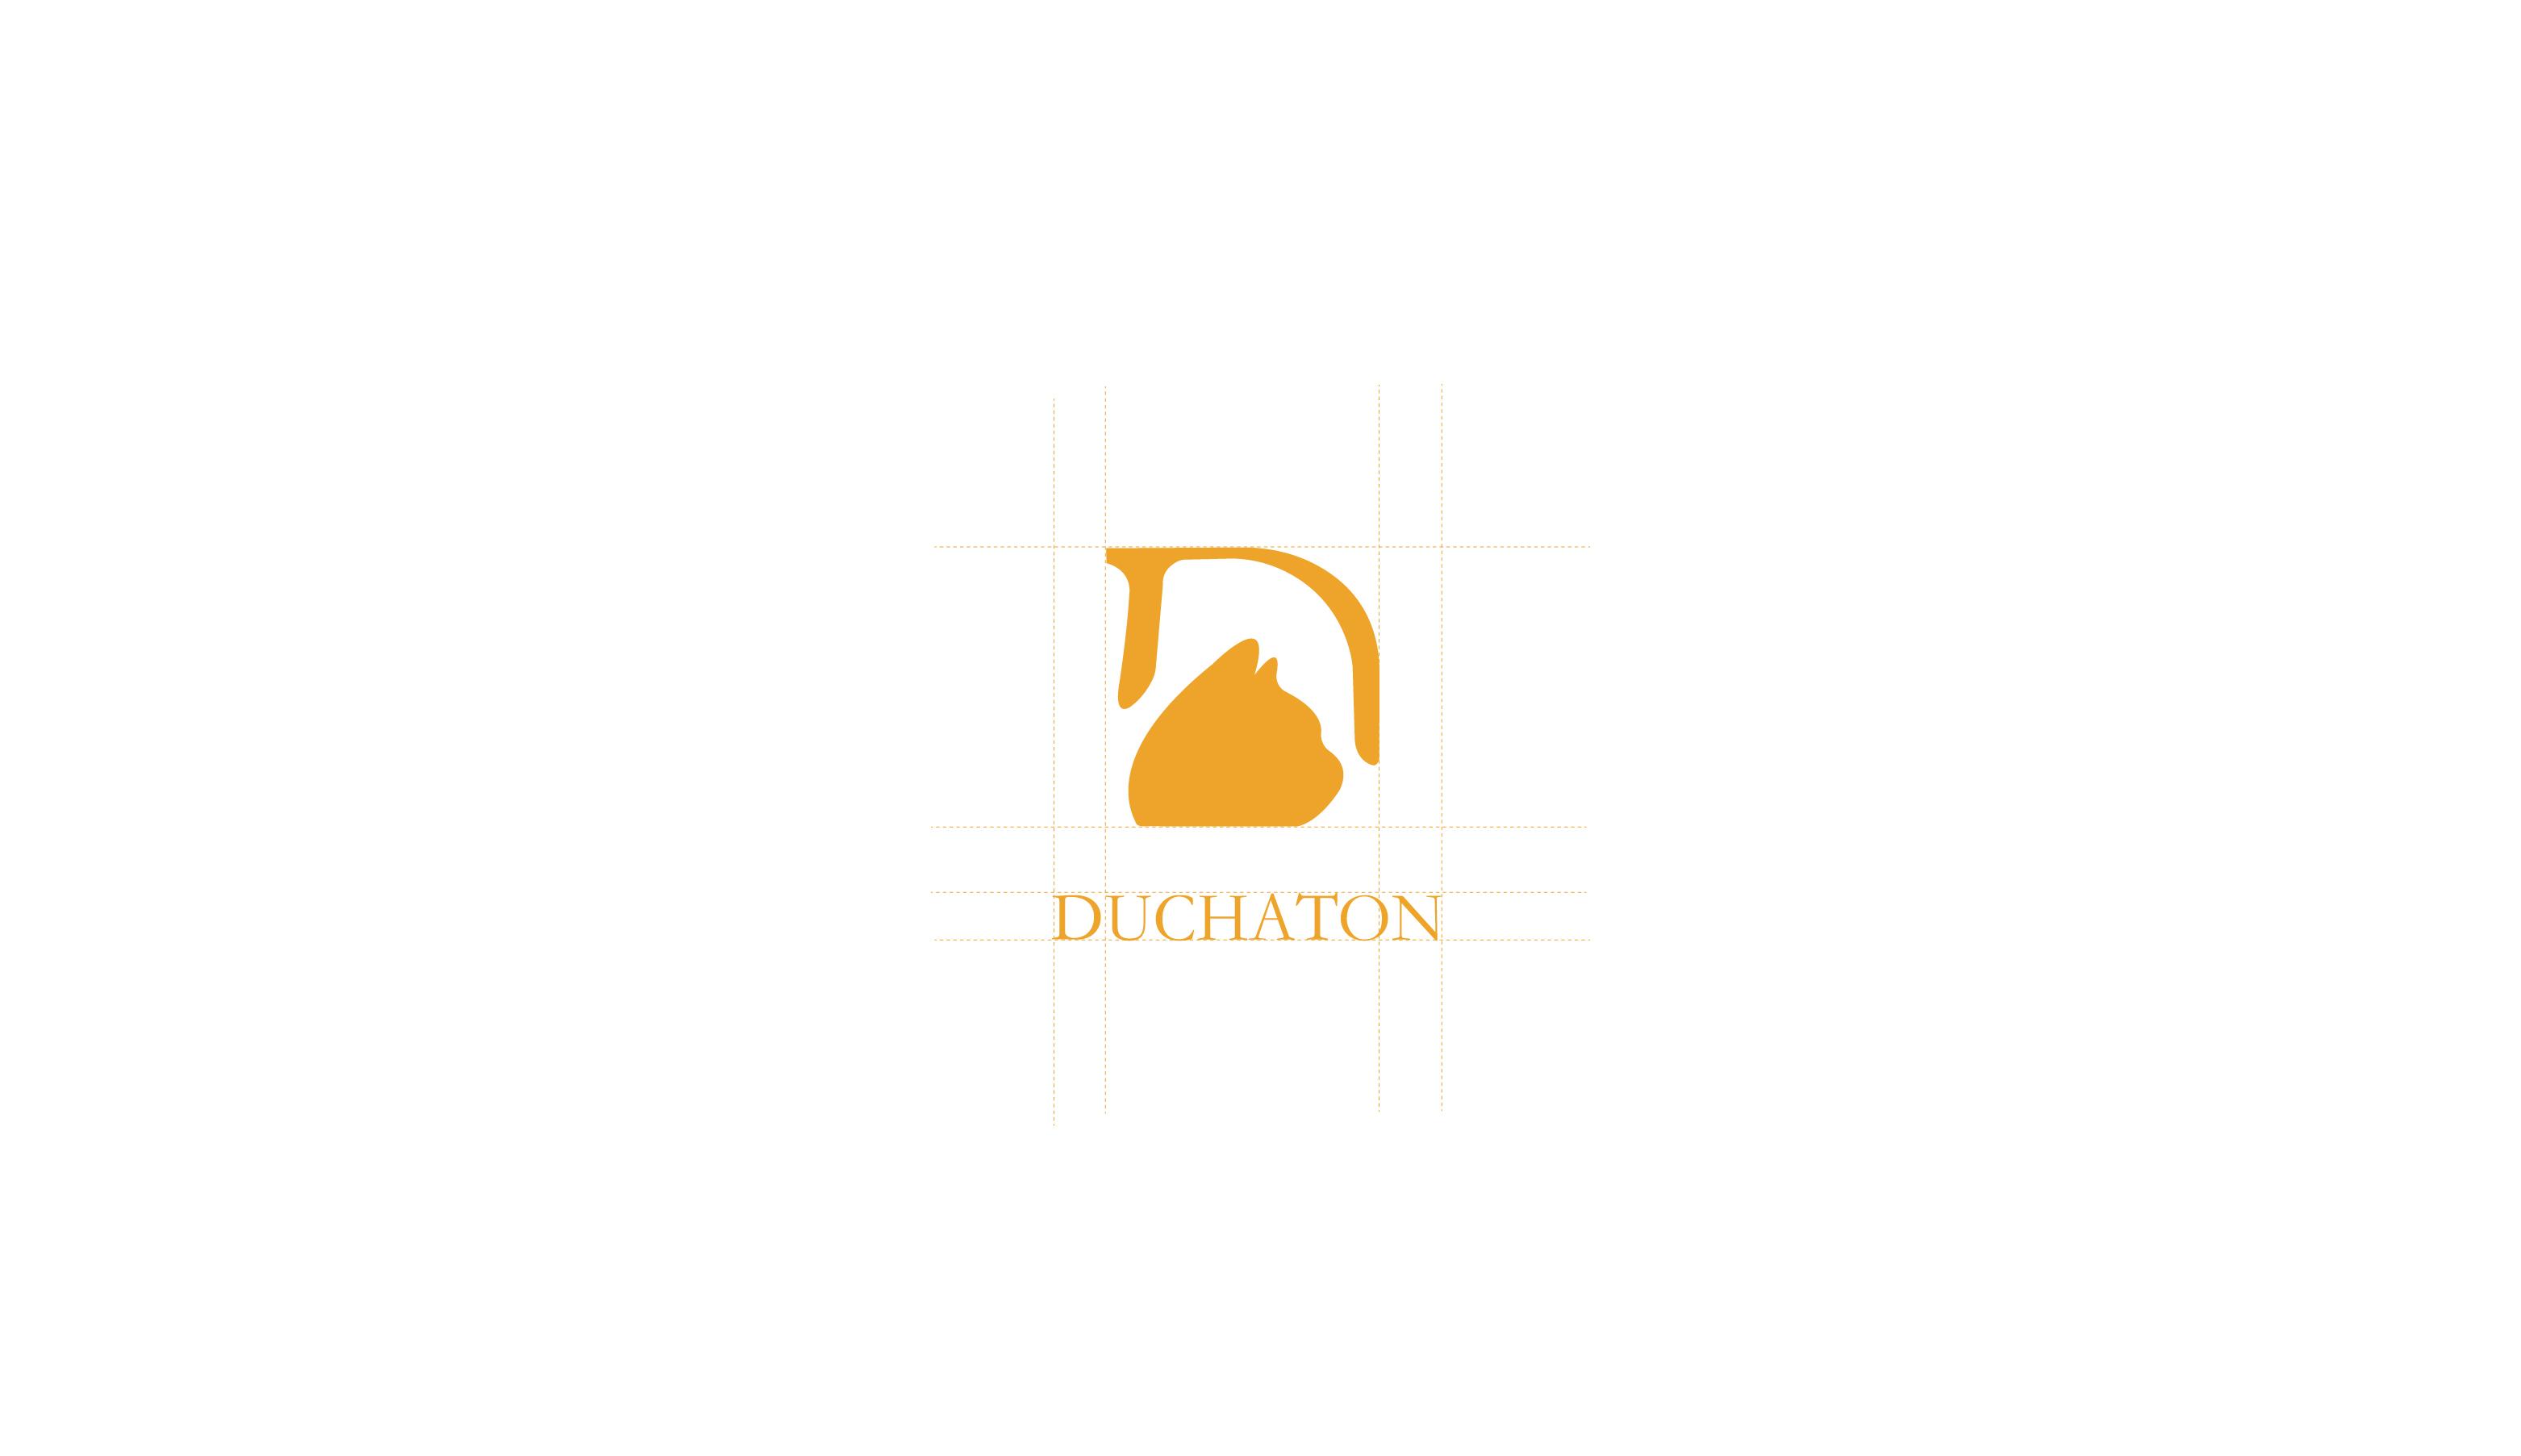 duchaton貓公爵logo